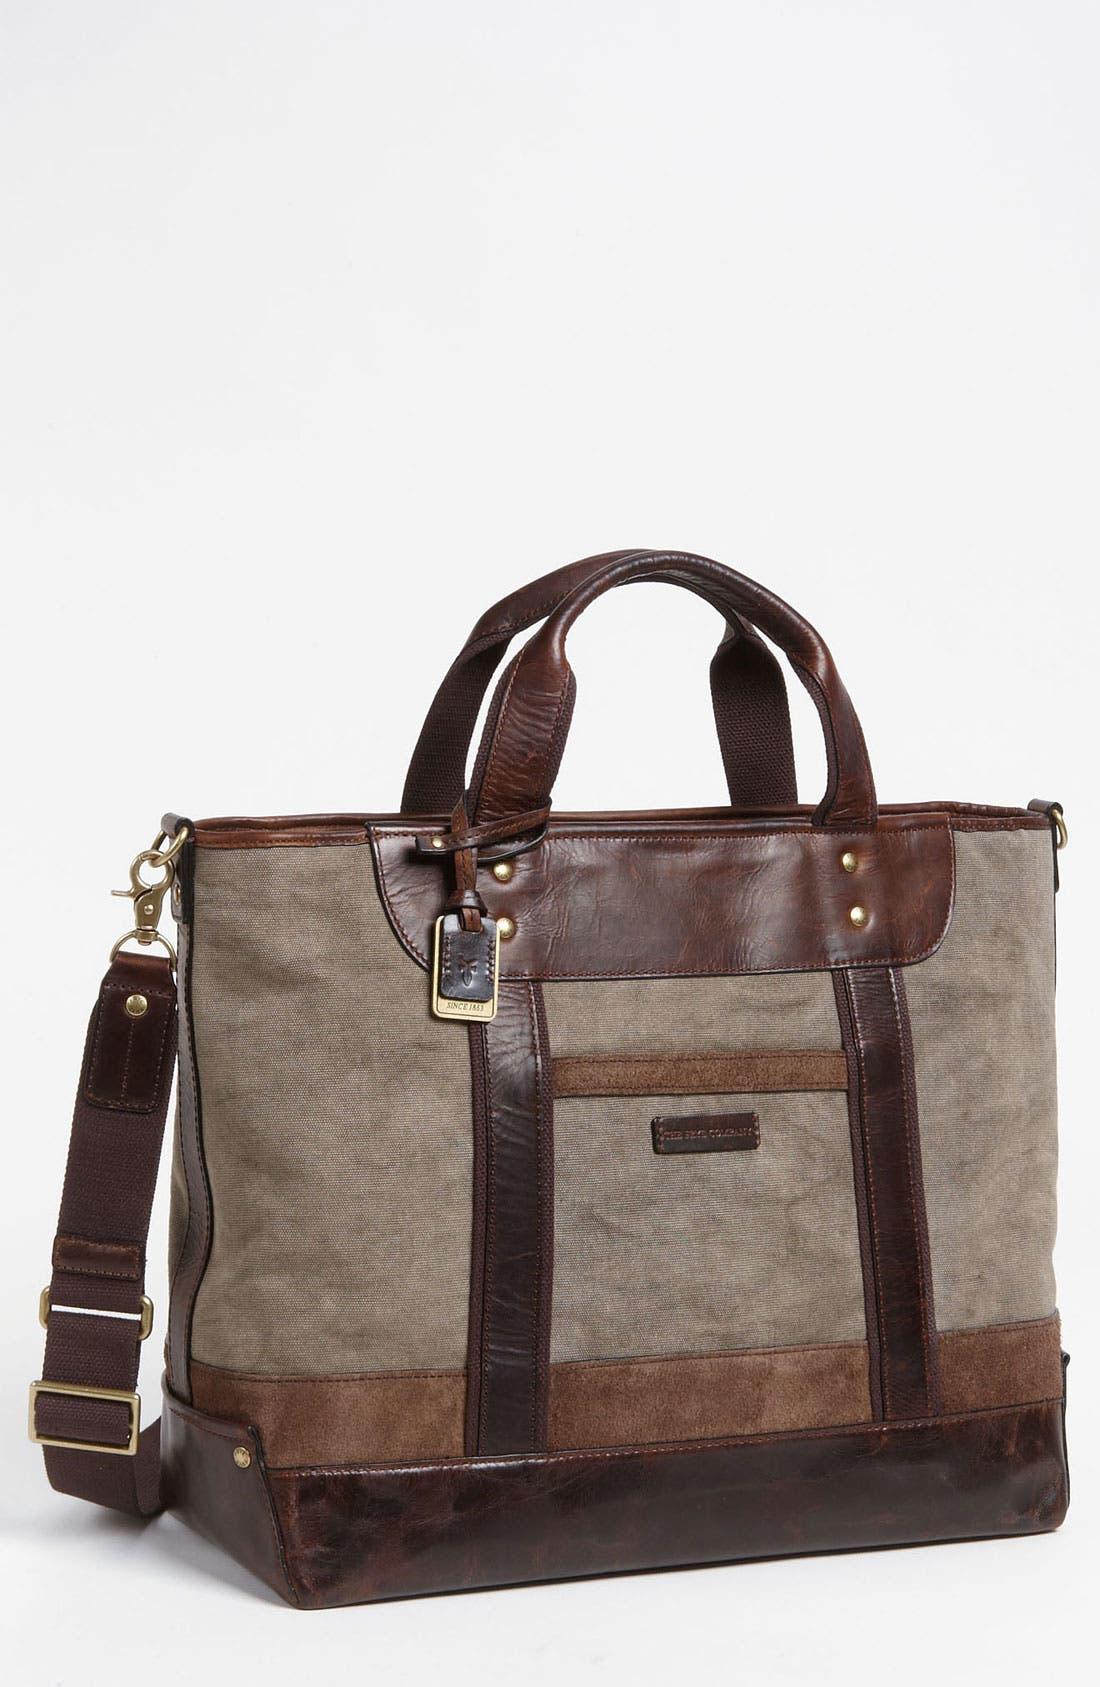 Alternate Image 1 Selected - Frye 'Harvey' Tote Bag